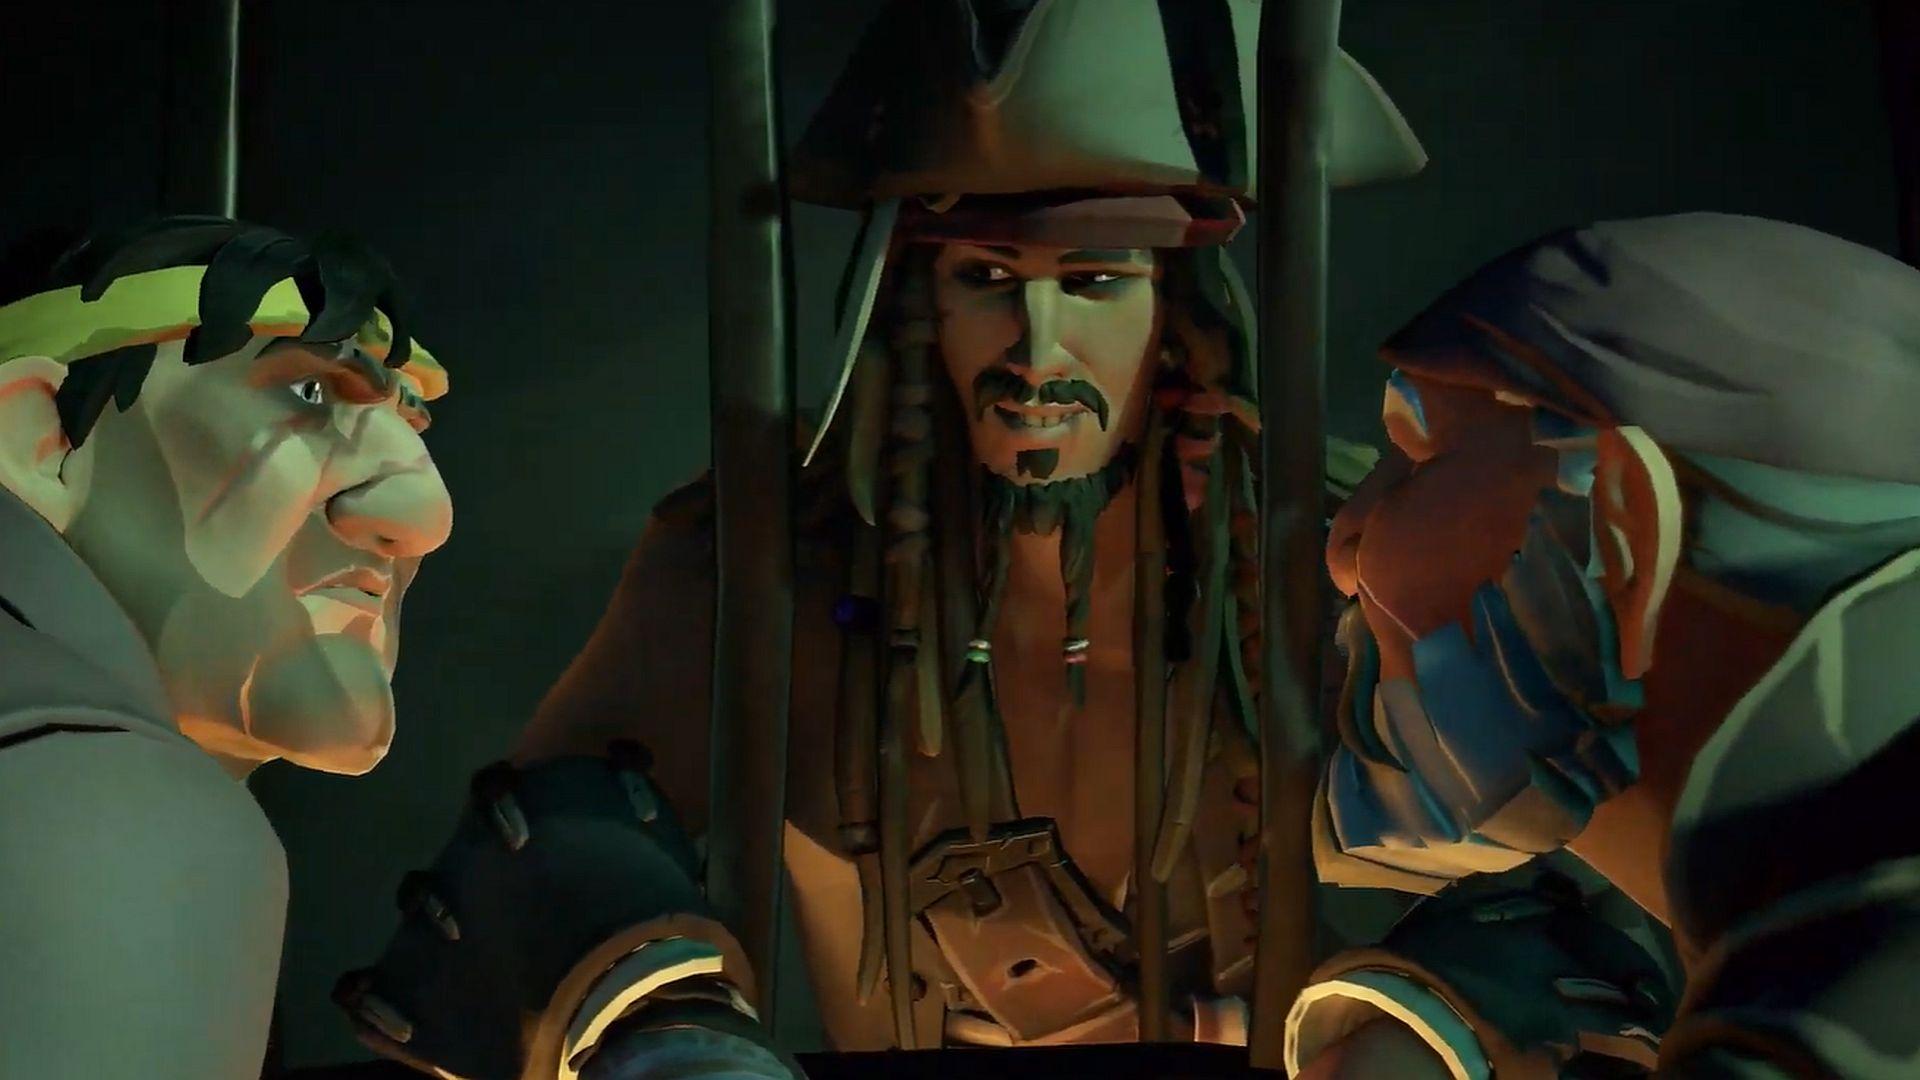 Sea of Thieves เปิดตัวคอนเทนต์จากหนัง Pirates of the Caribbean